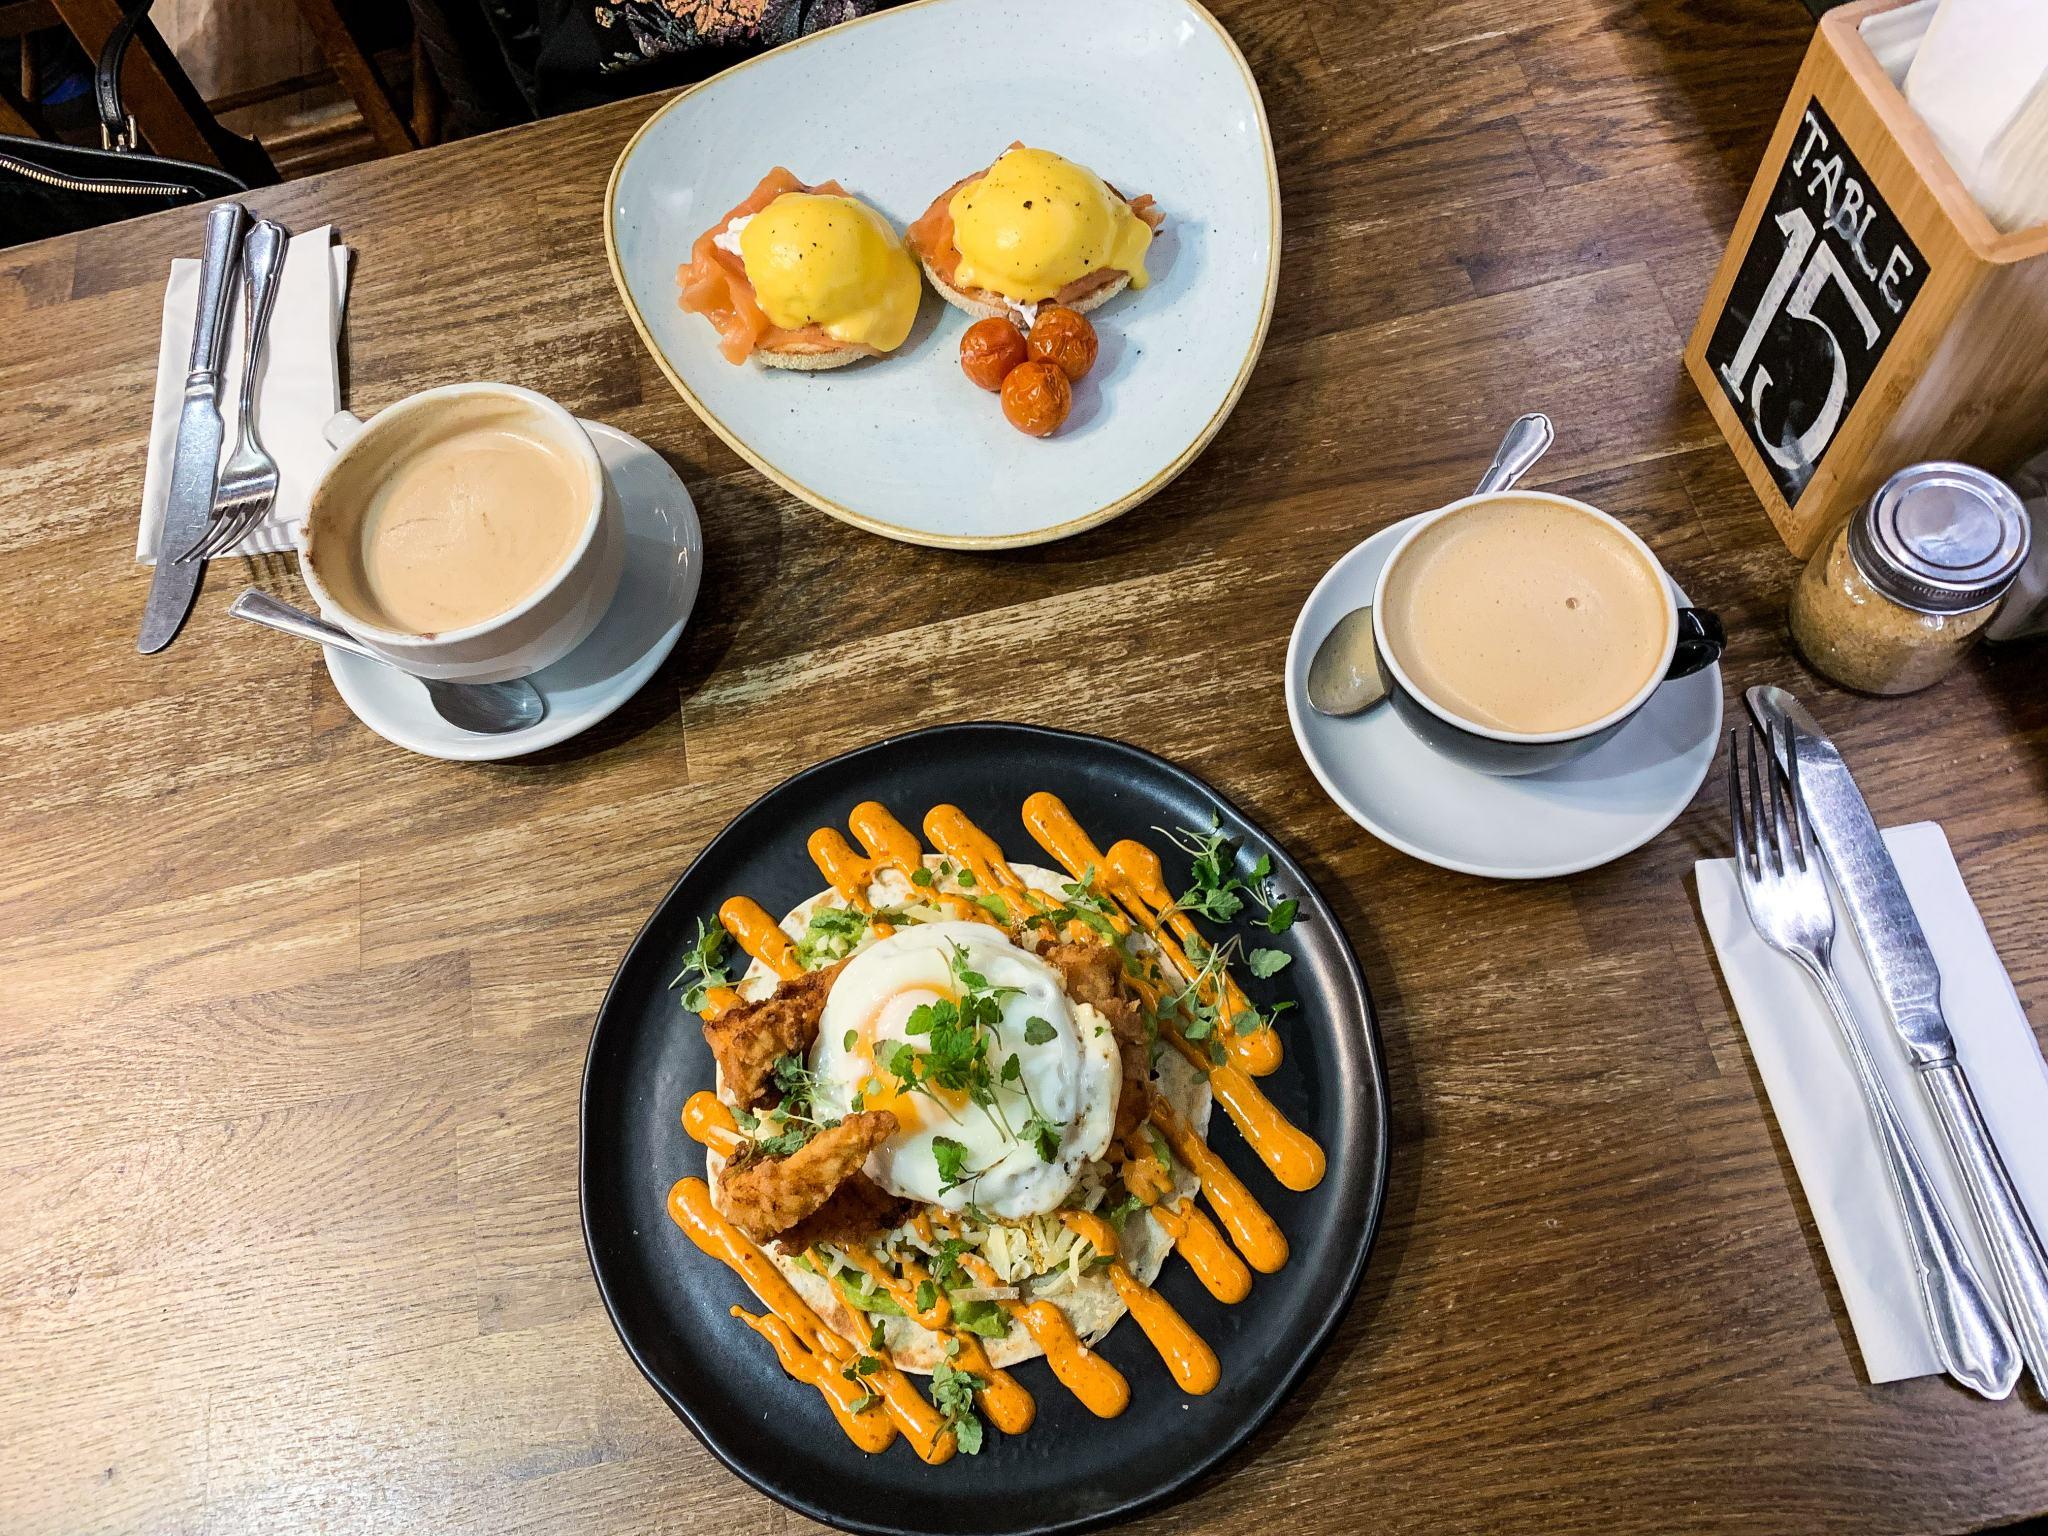 brunch at josie's - breakfasts in hampshire